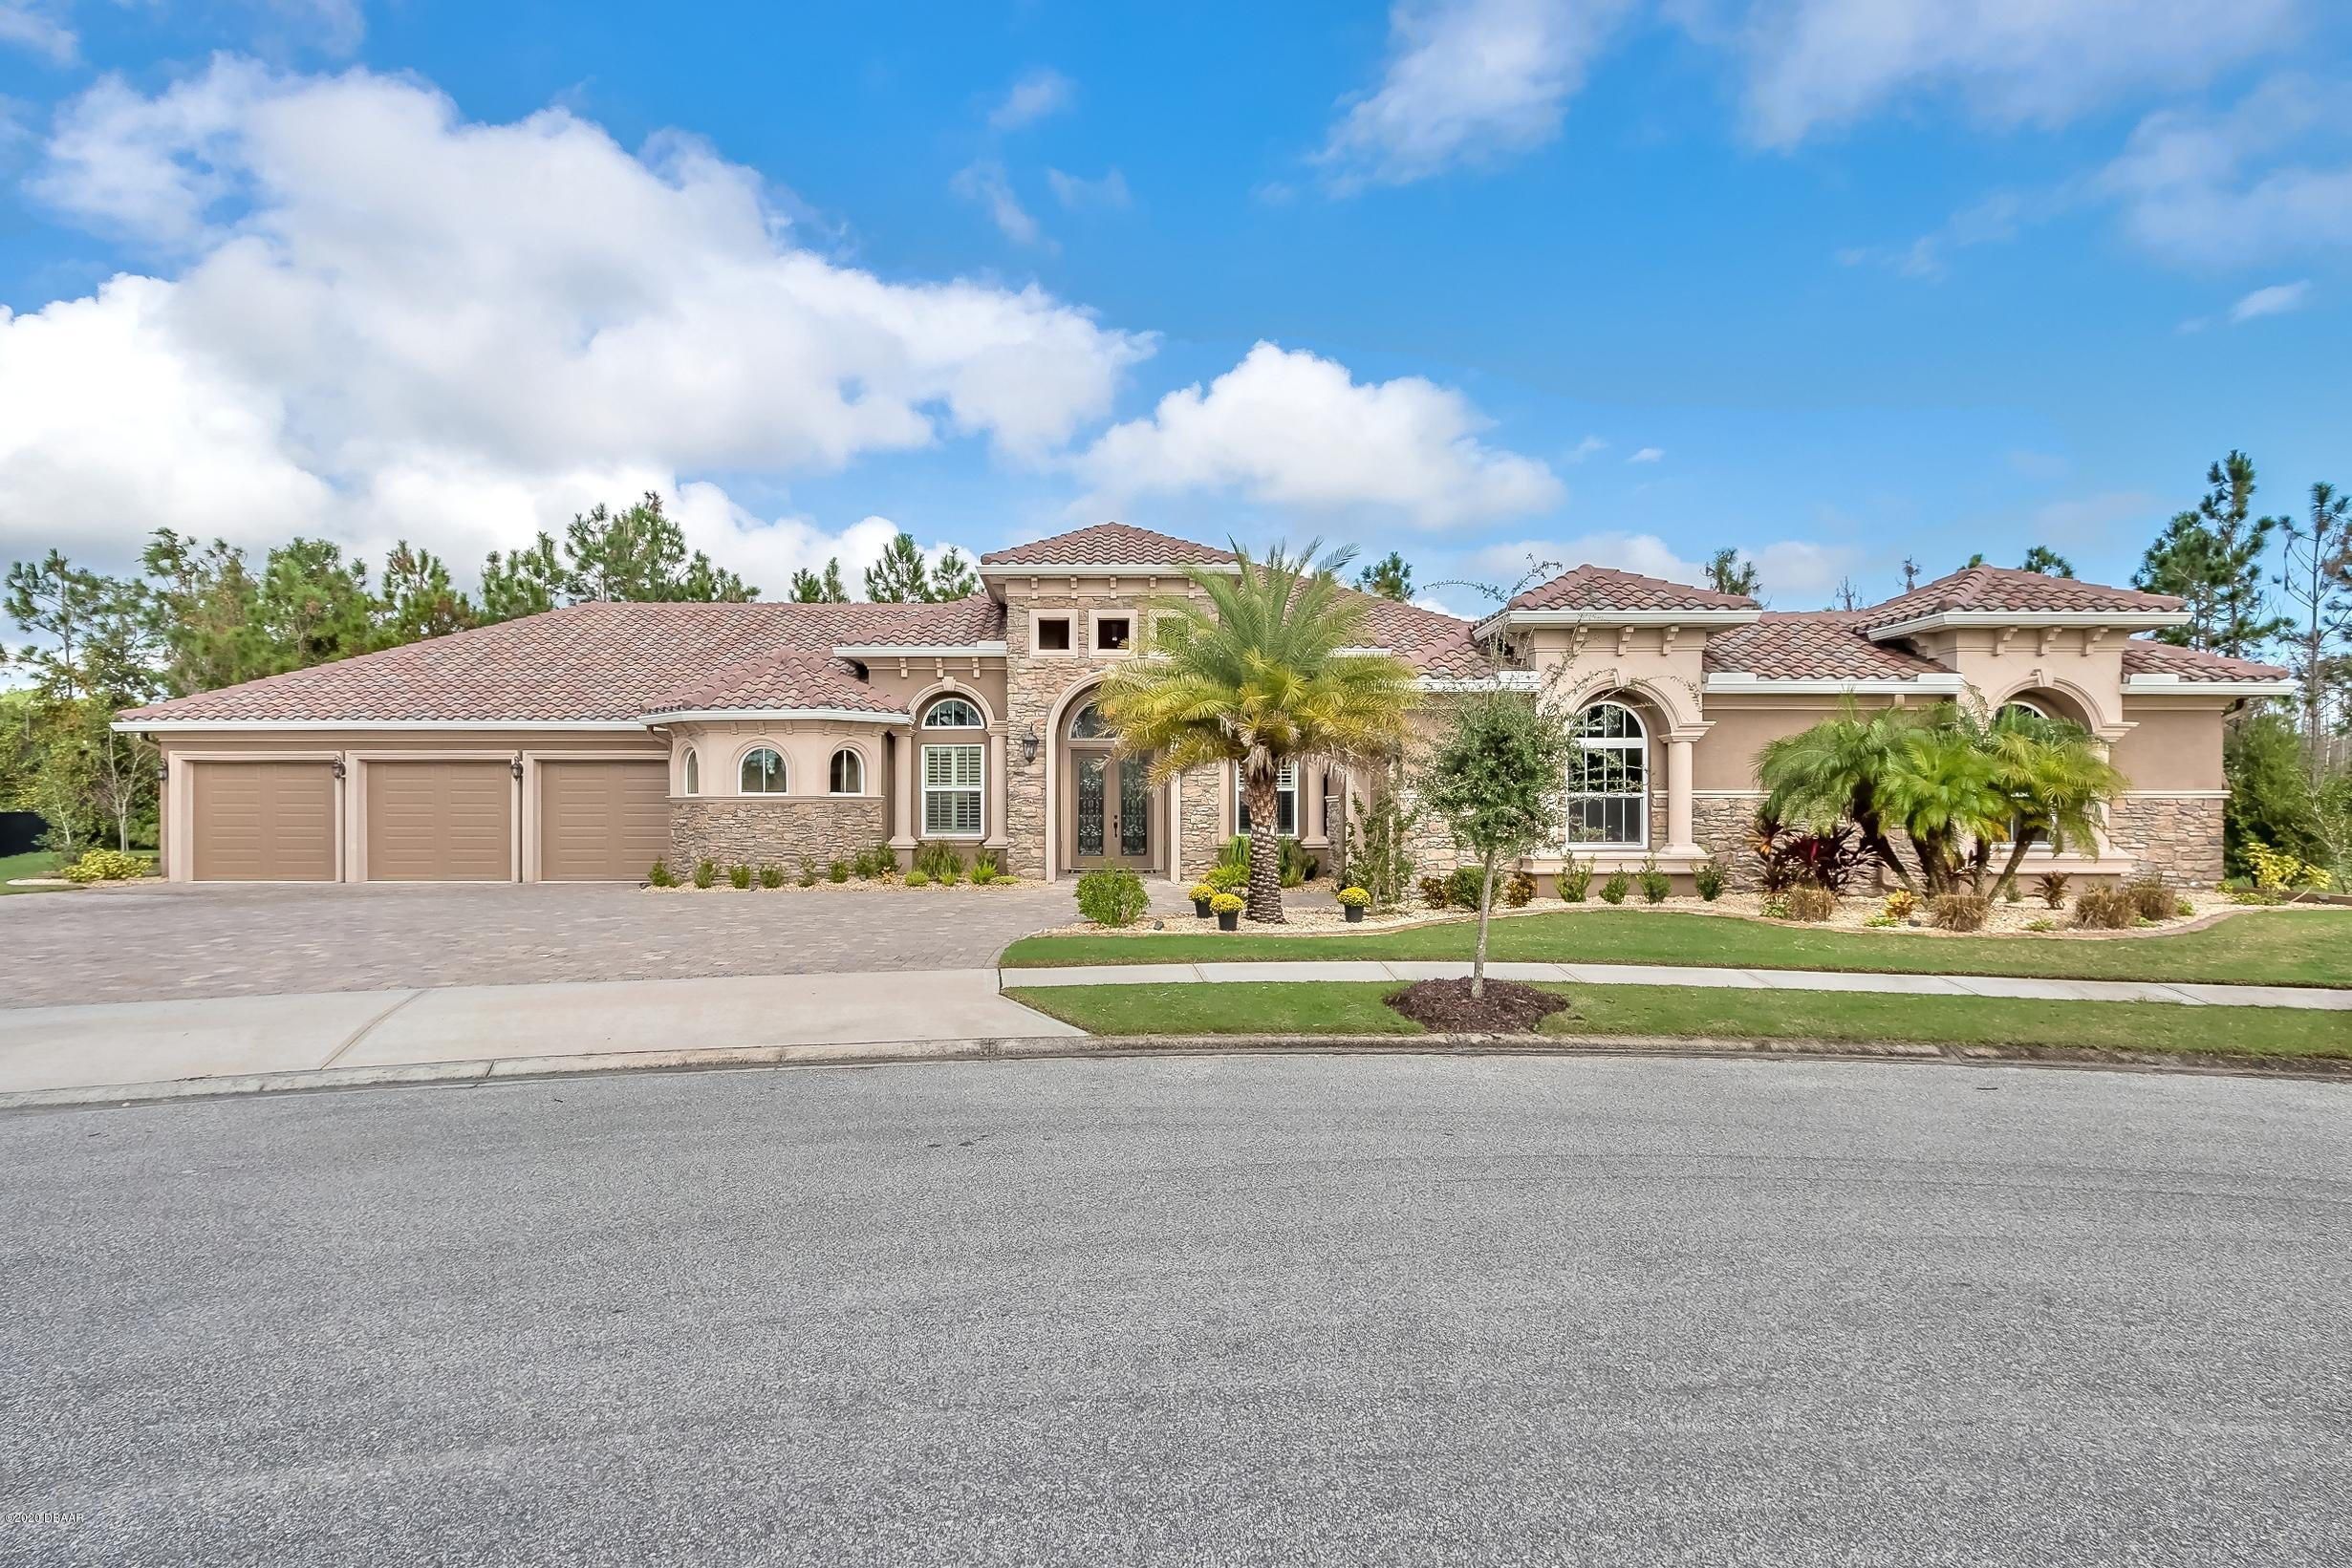 Photo of 2805 Paradiso Court, New Smyrna Beach, FL 32168